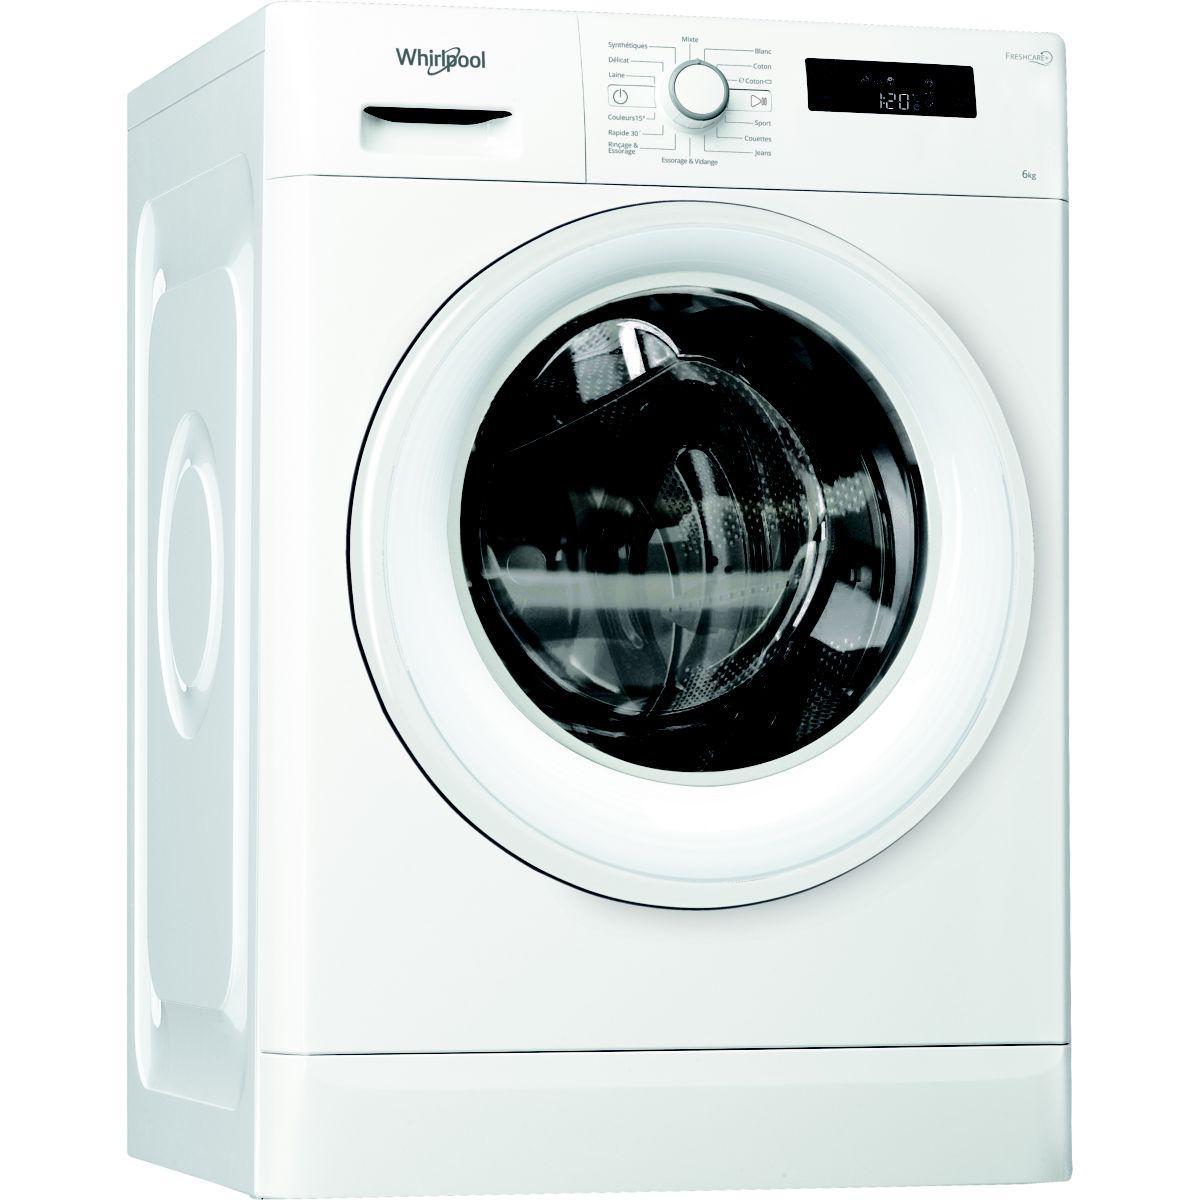 Lave-linge compact whirlpool freshcare fwsf61252 - 2% de remise imm?diate avec le code : wd2